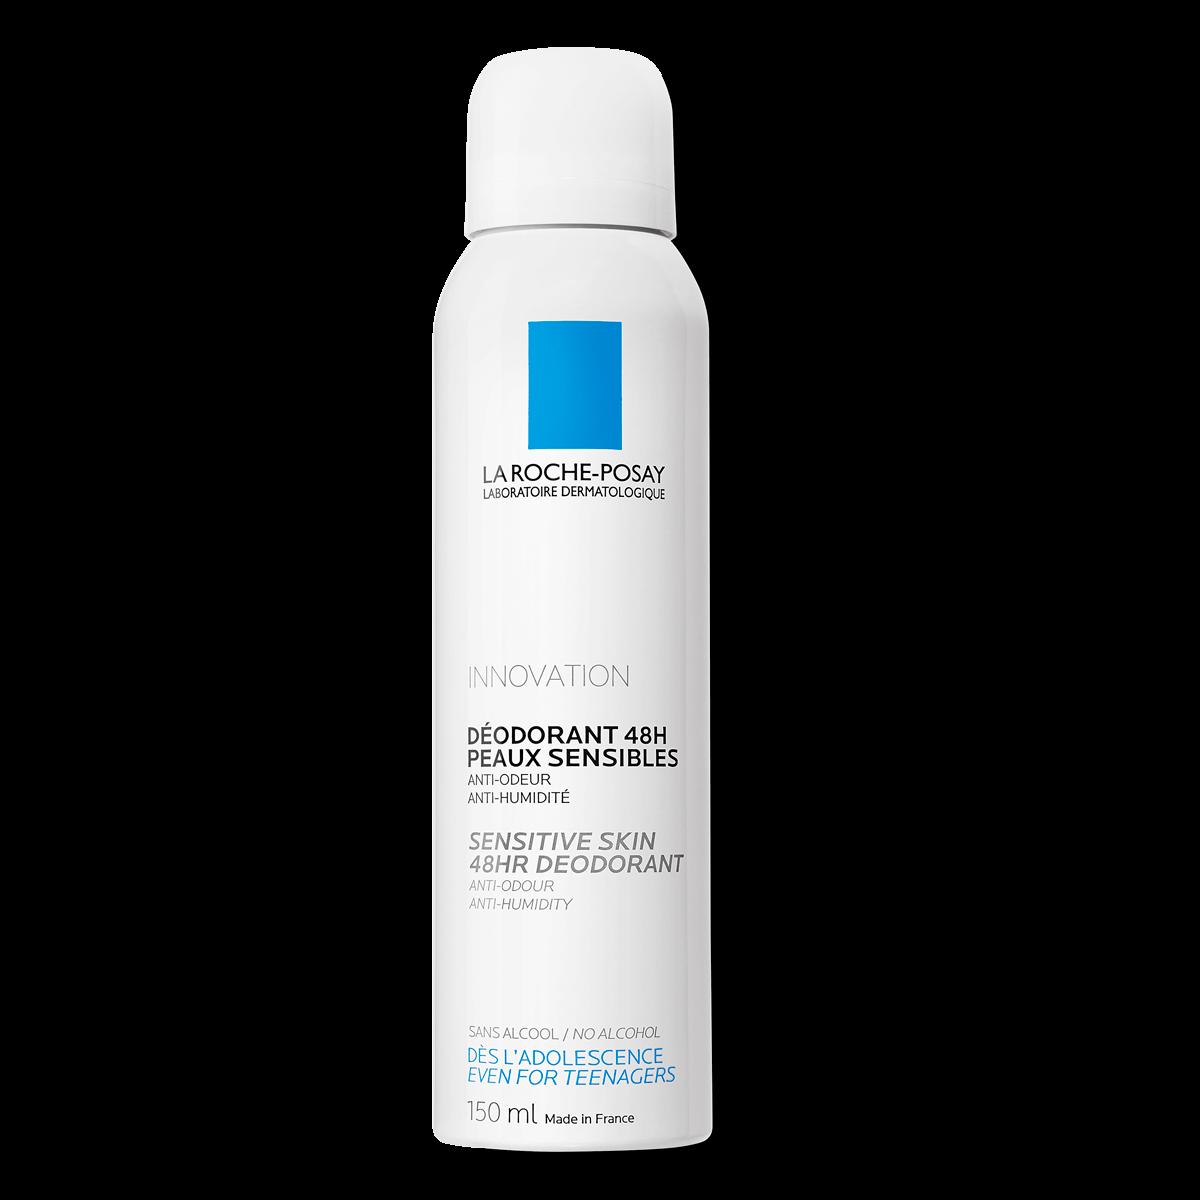 La Roche Posay ProductPage Deodorant 48h Sensitive Skin Spray Anti Odo